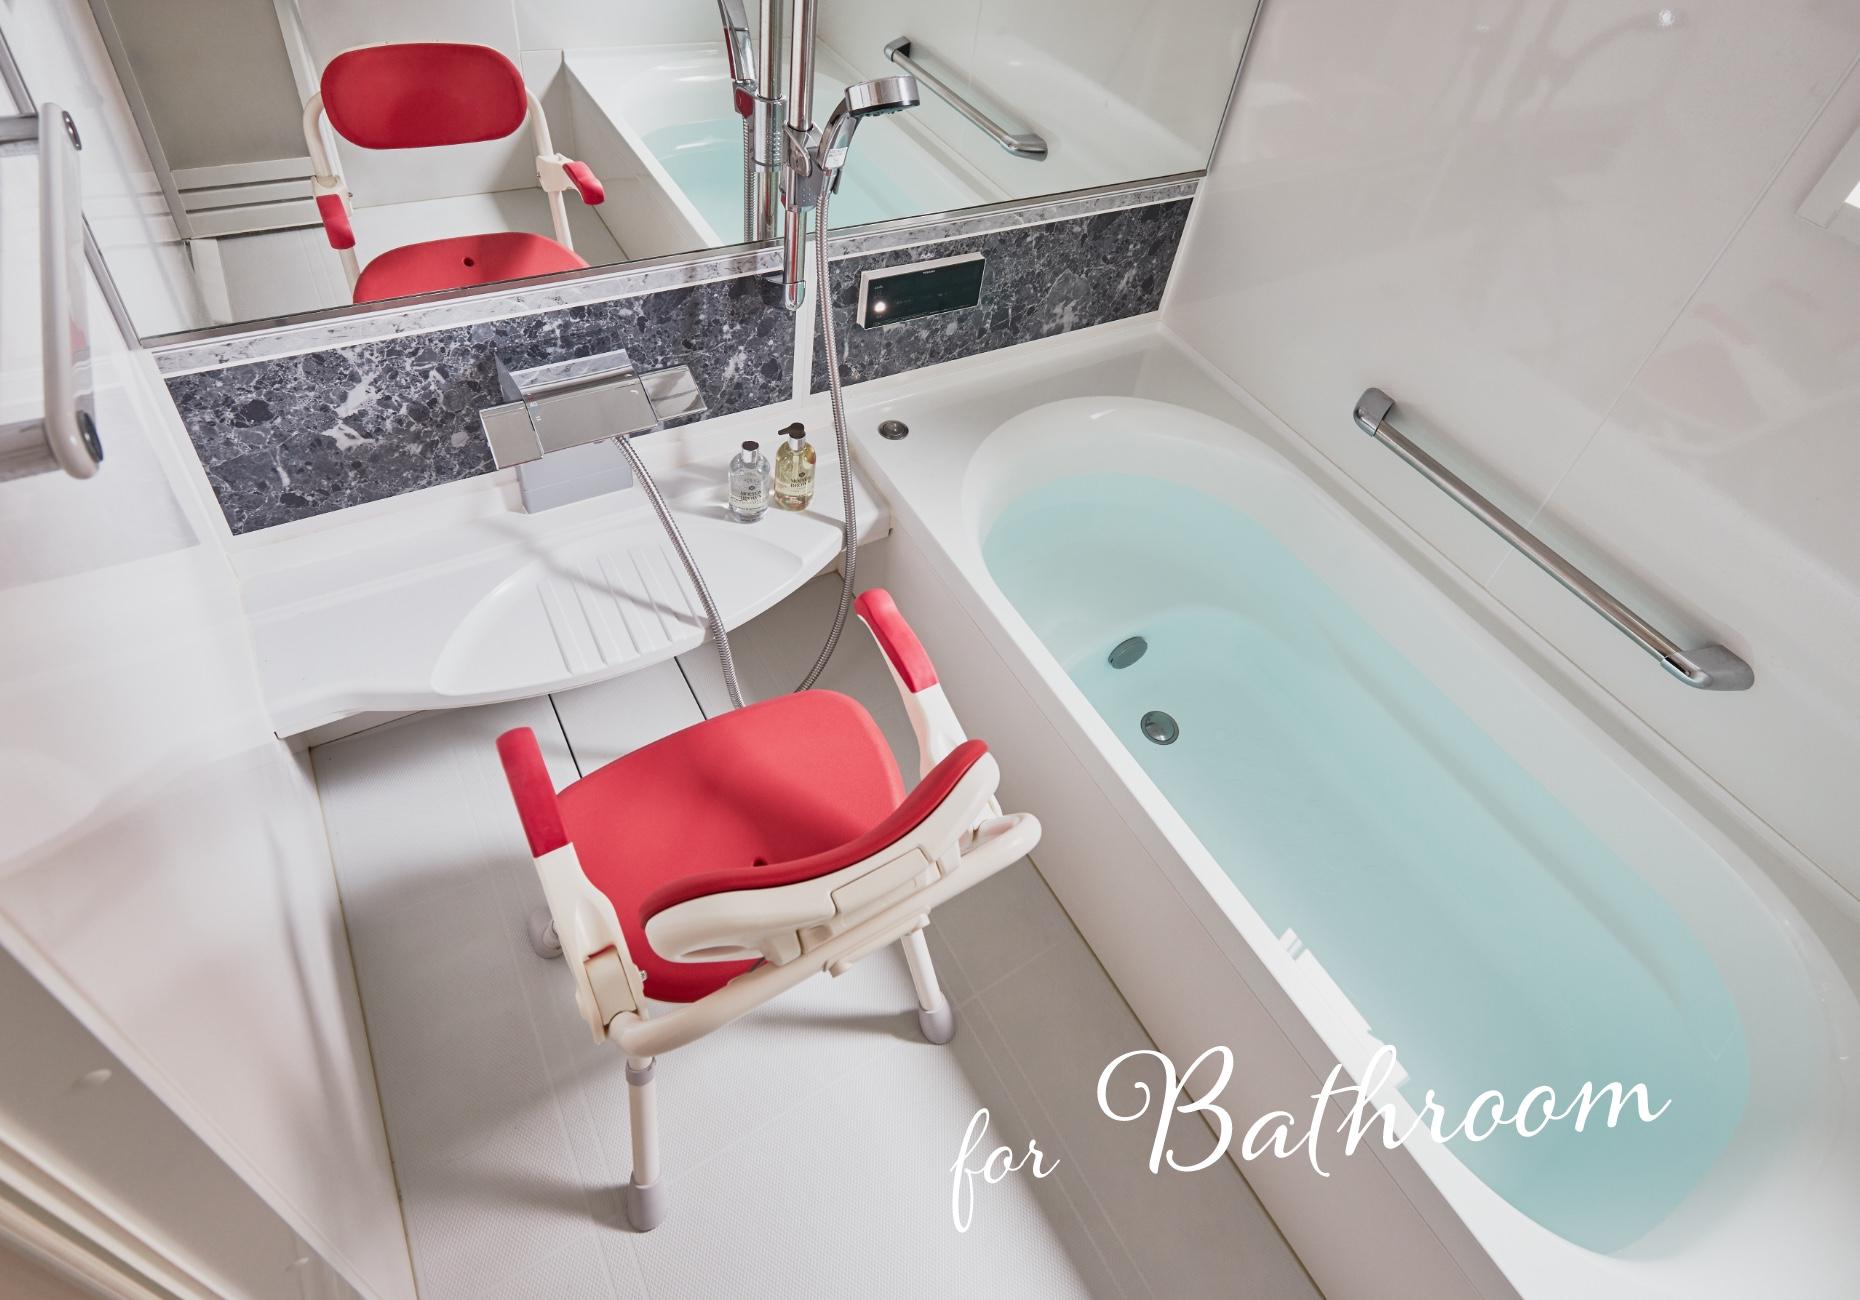 for Bathroom